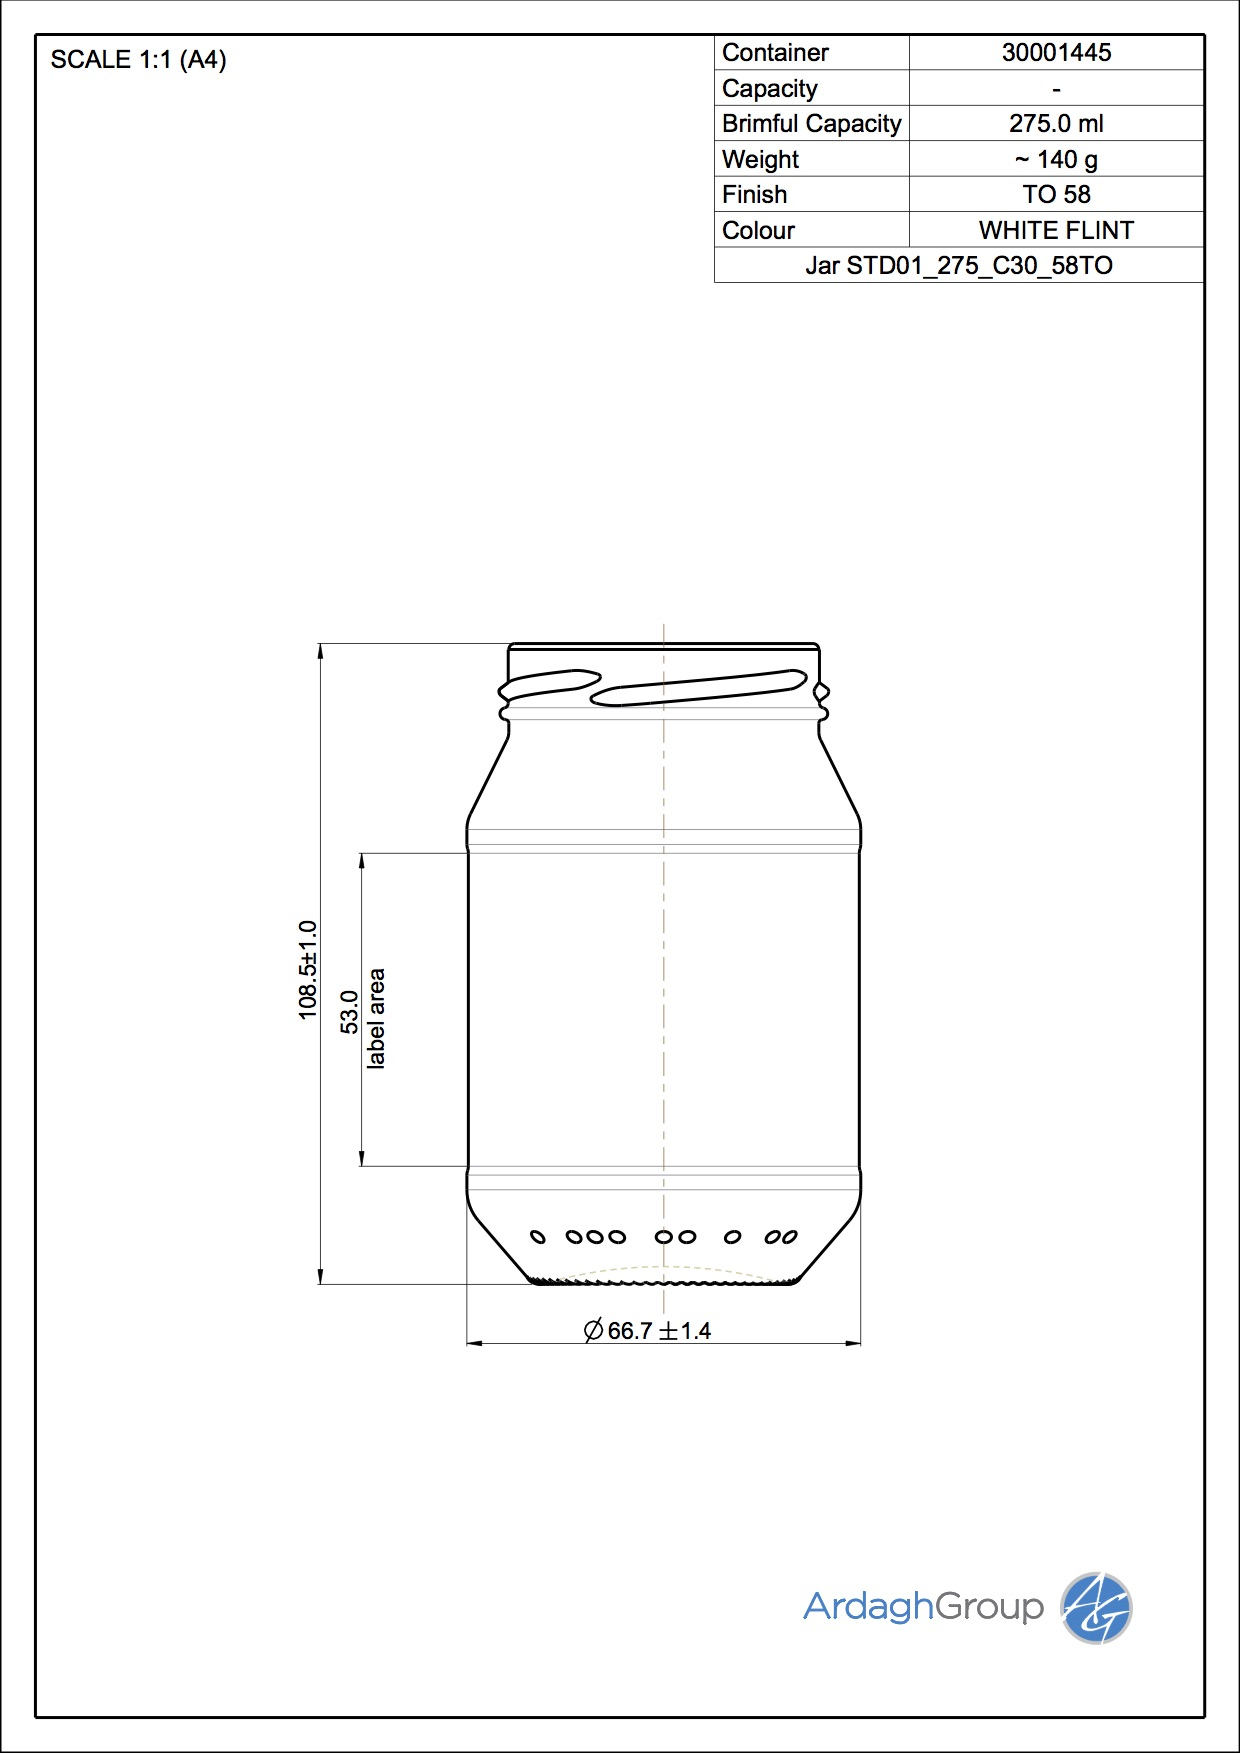 Jar STD01 275 C30 58TO